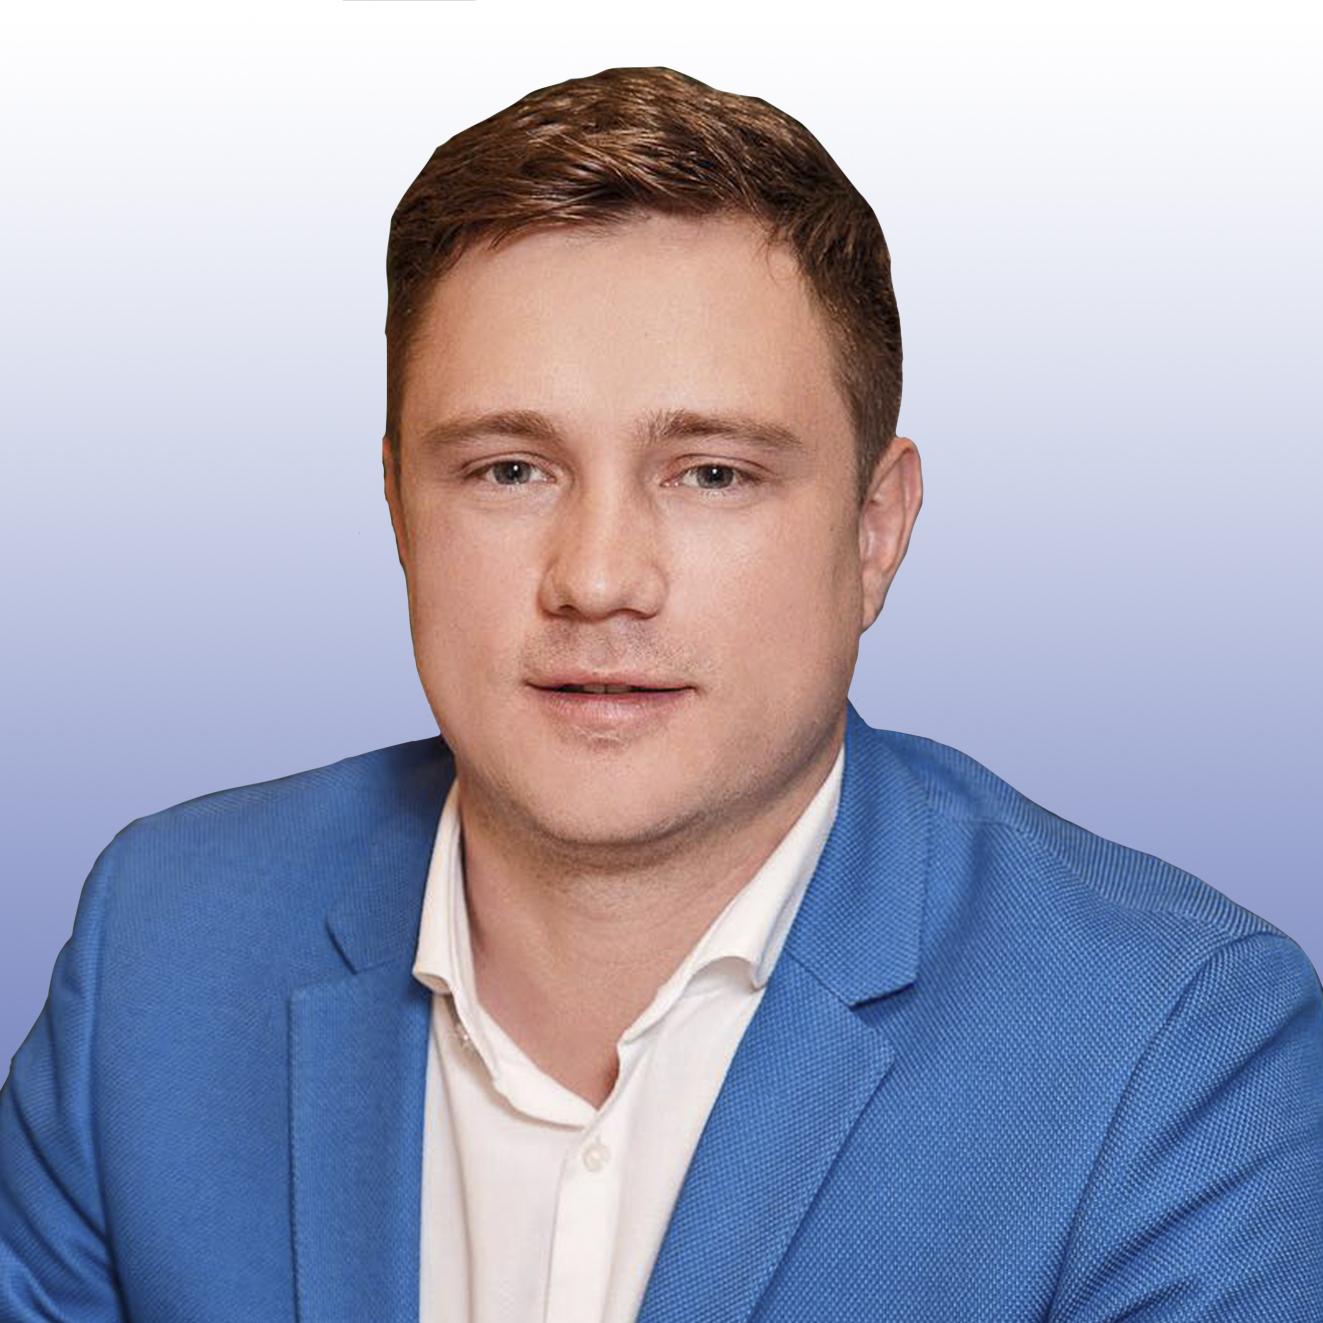 Погребов Роман Валерьевич